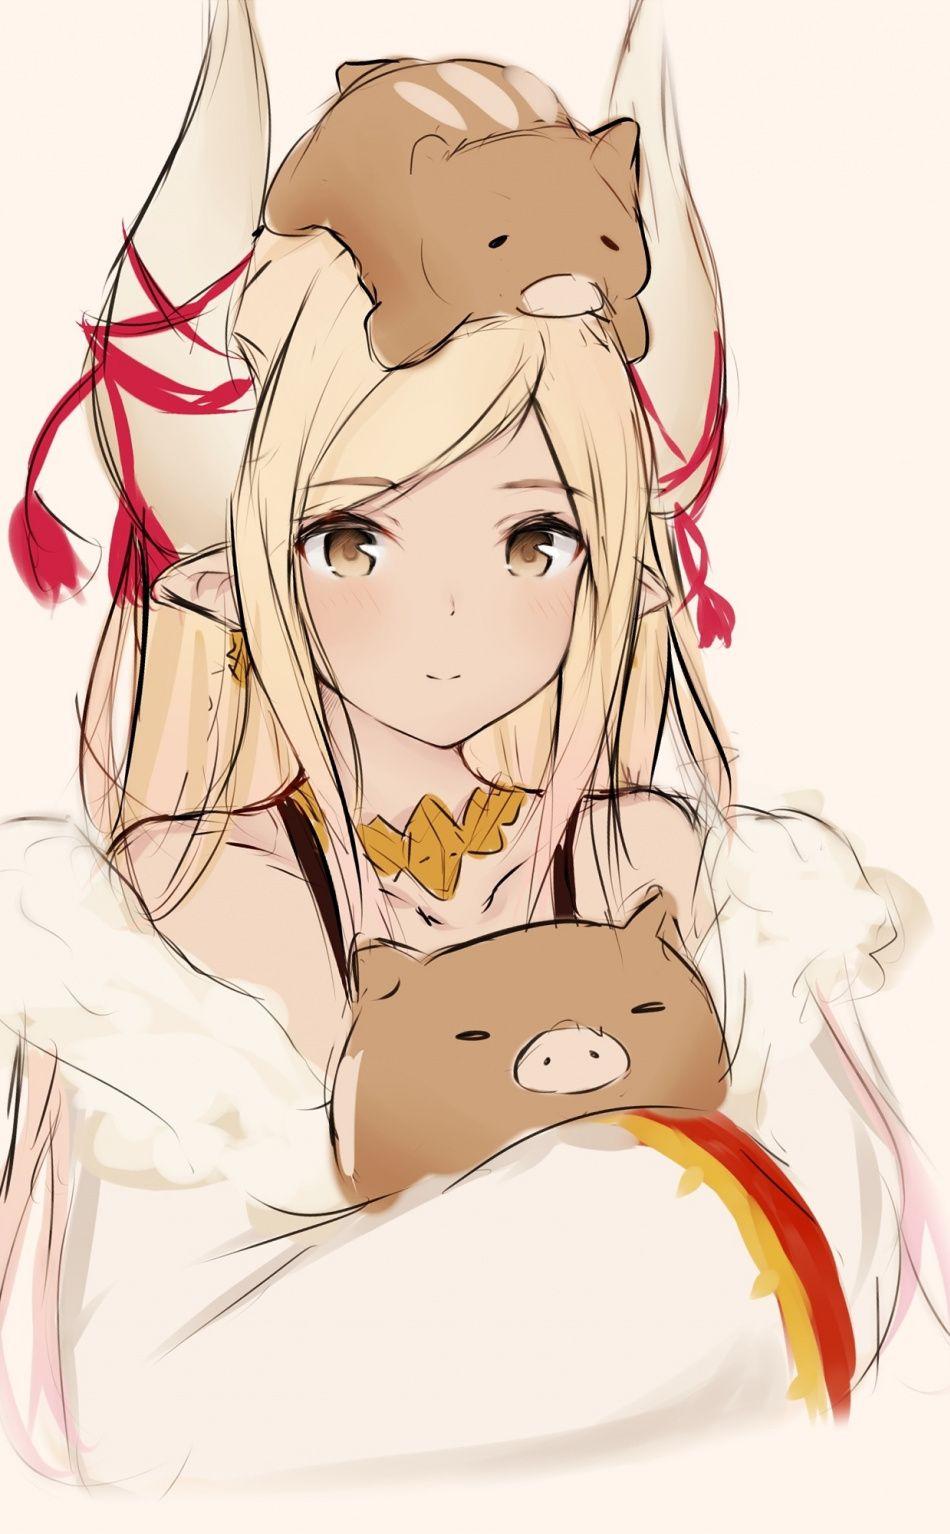 Cute Anime Gamer Girl Wallpapers - Wallpaper Cave